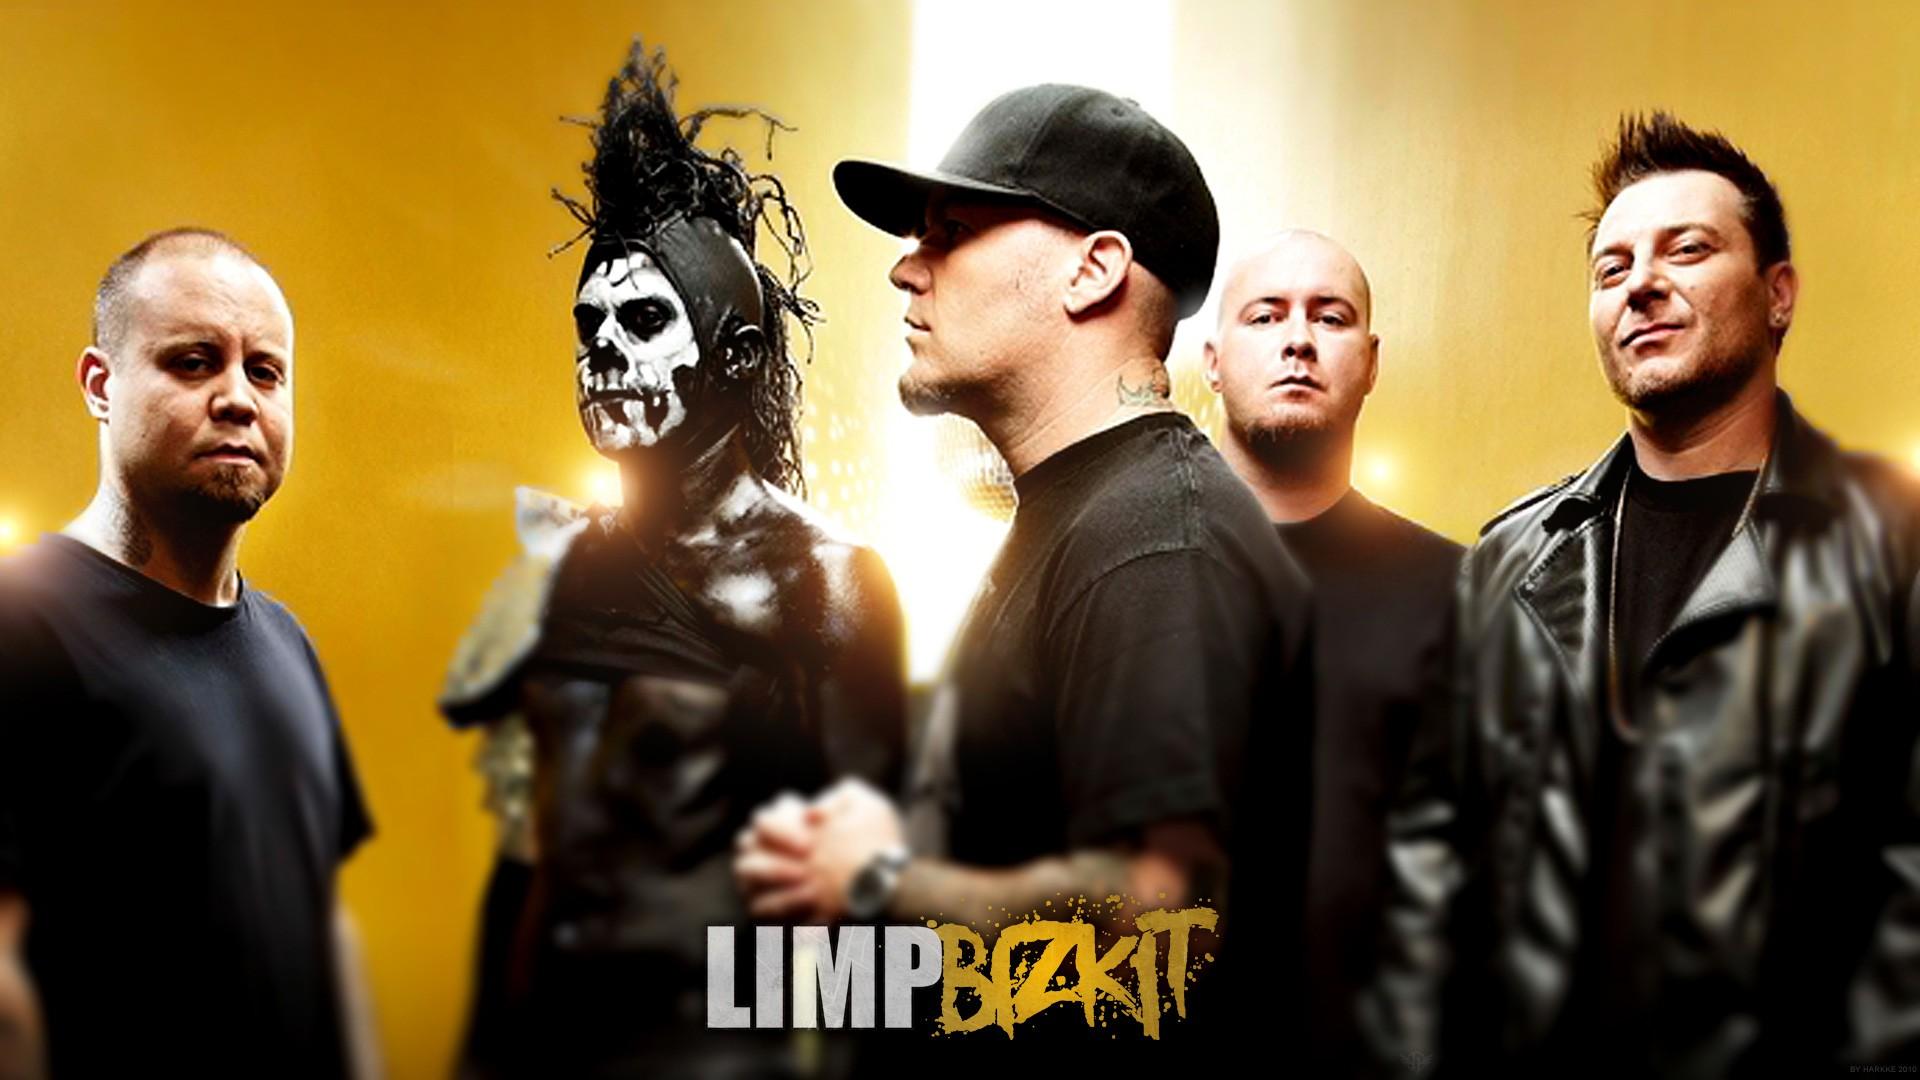 Limp Bizkit ищут группу на разогрев для концерта в Челябинске